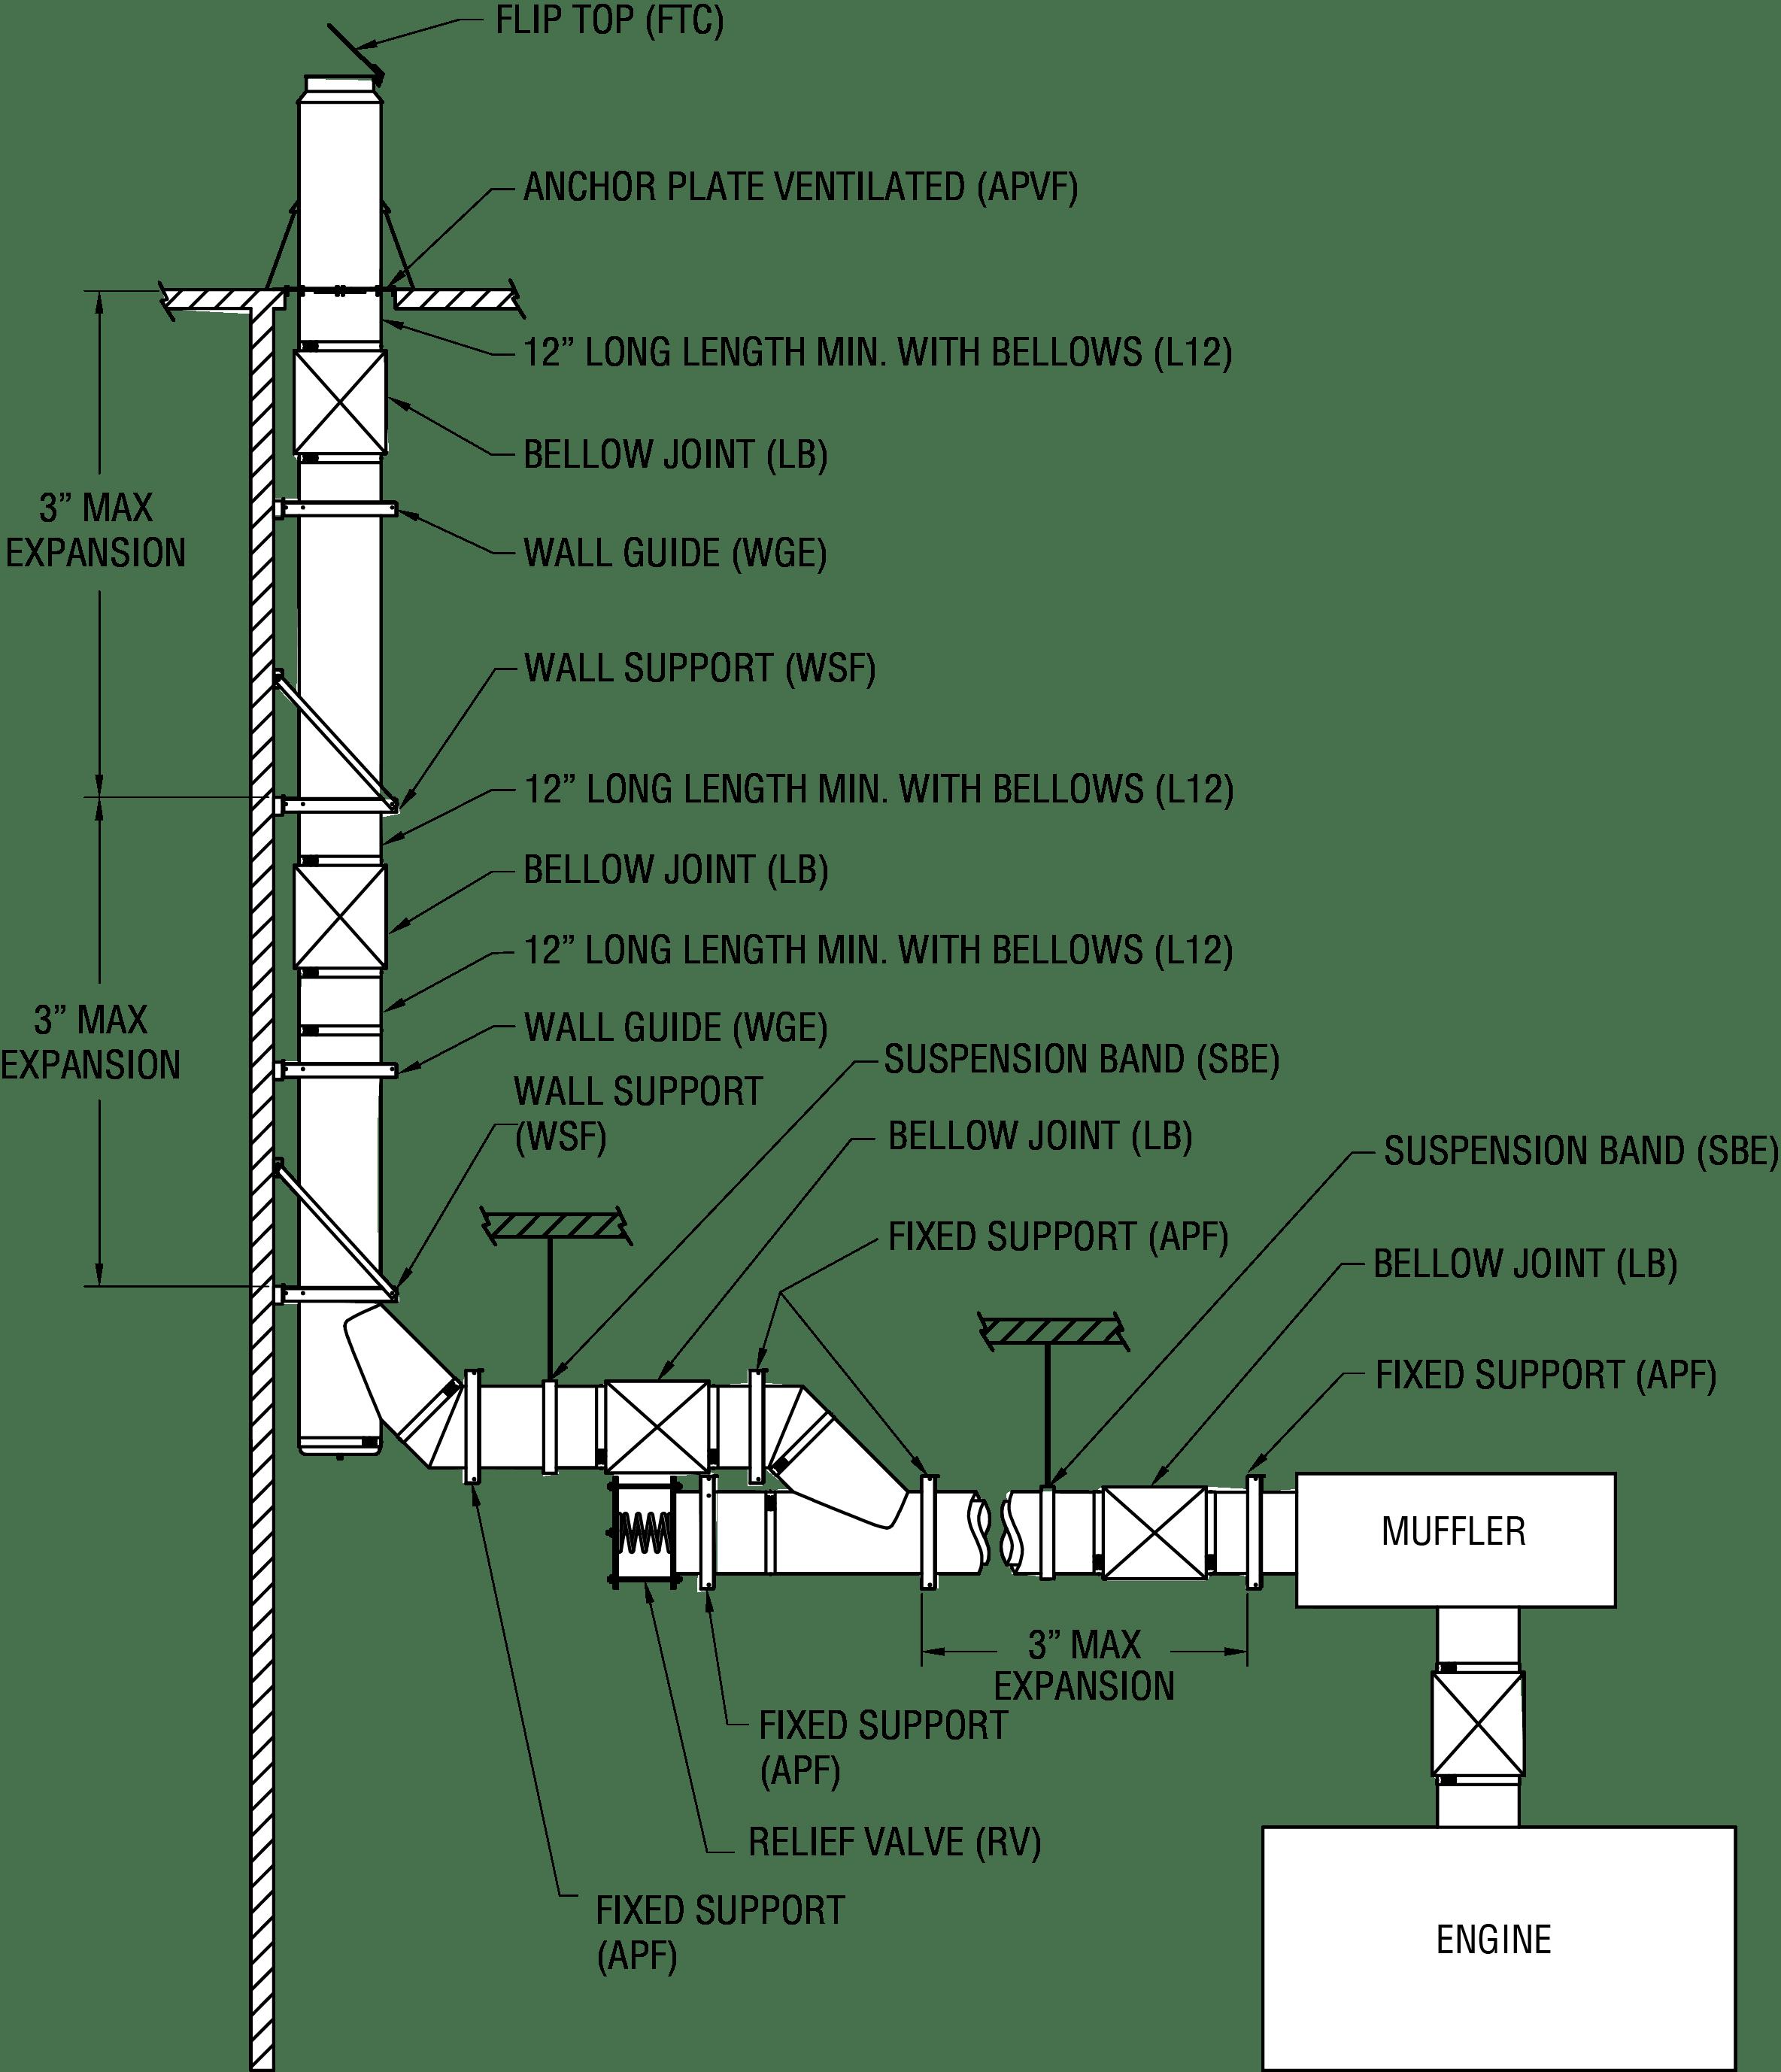 CIX - Diesel application